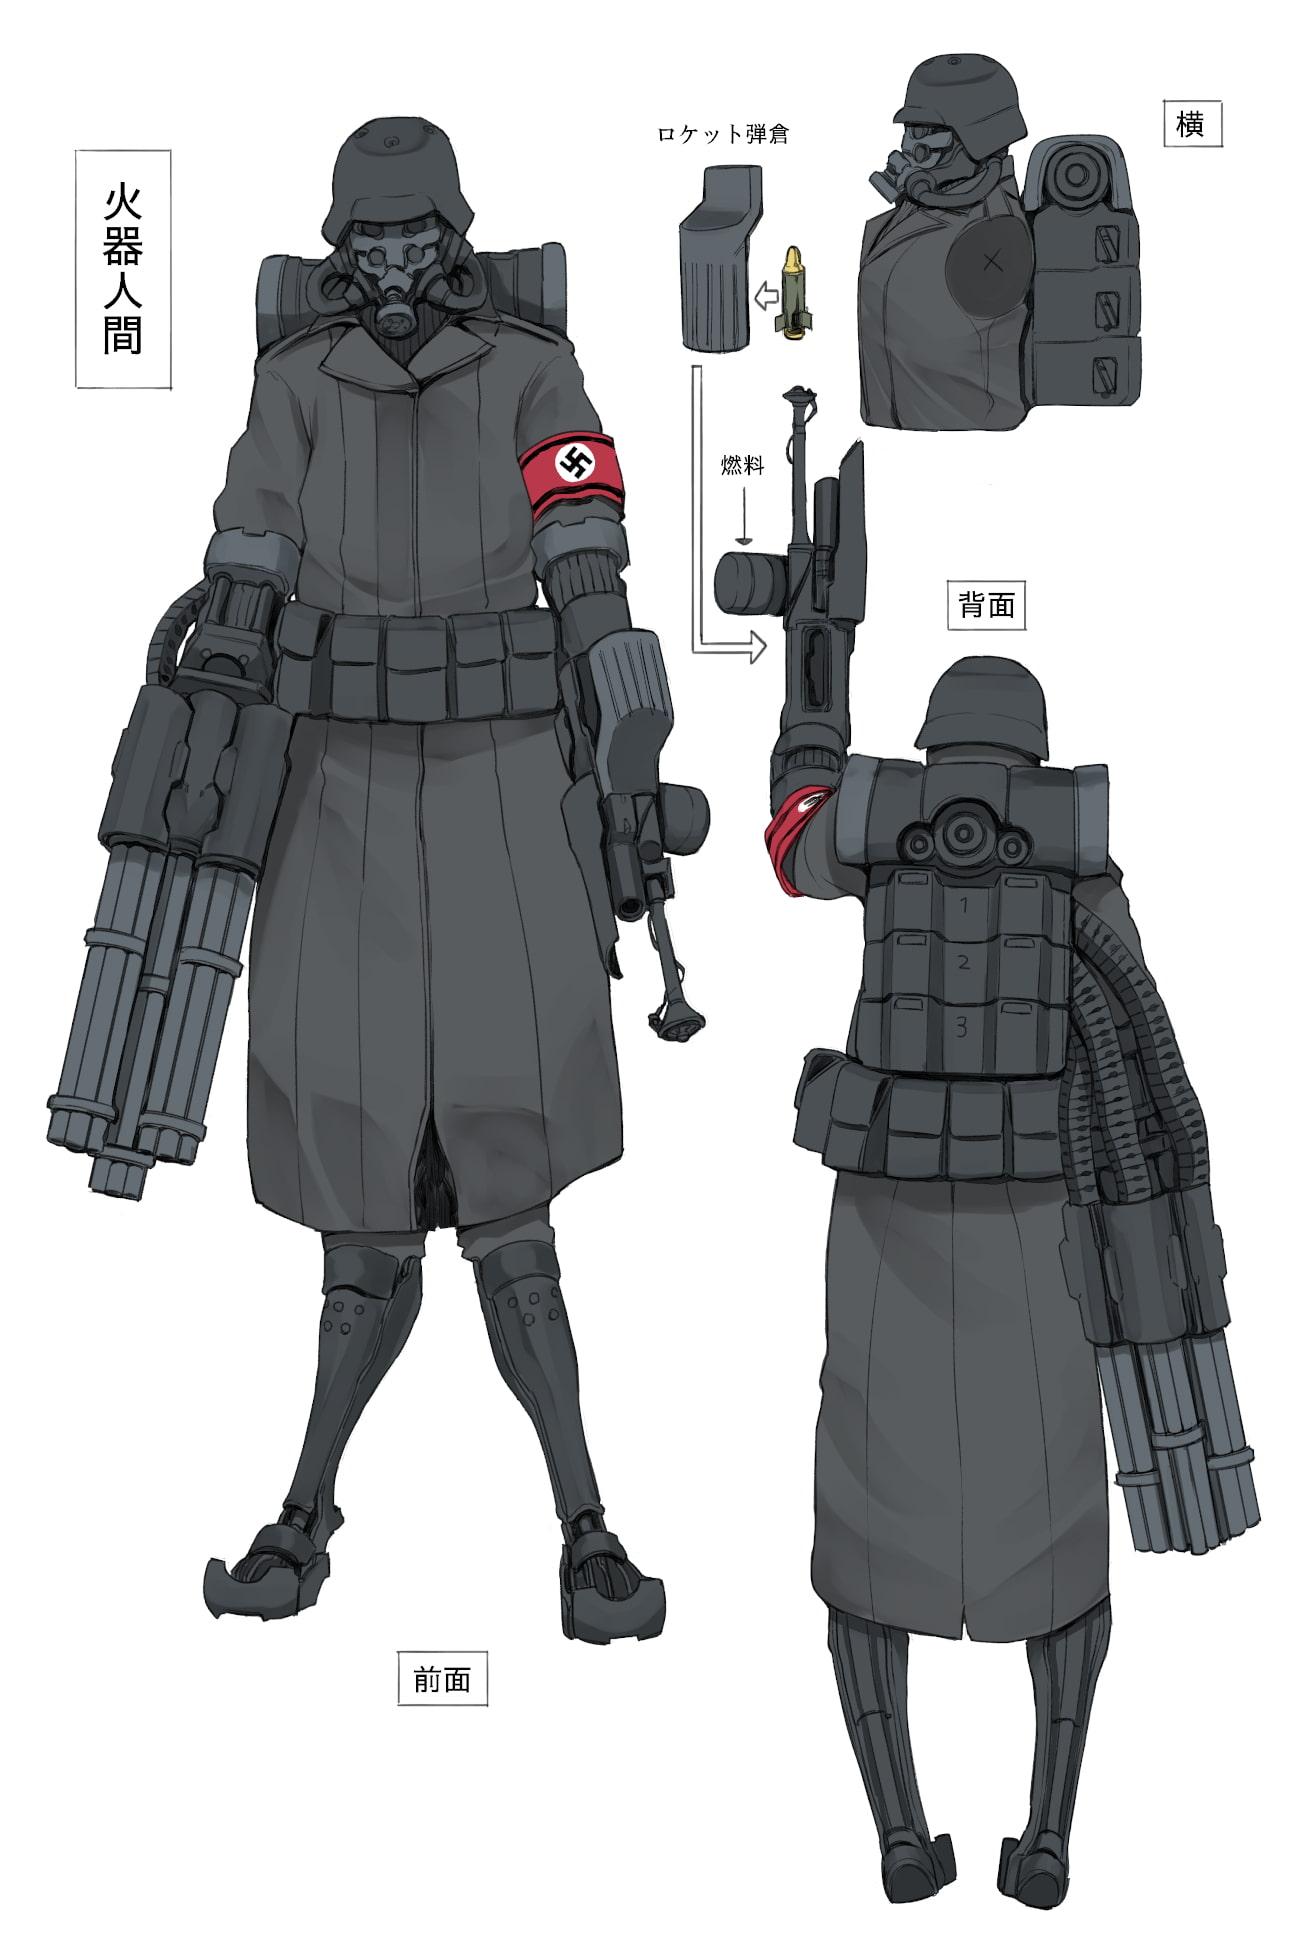 RJ314647 ナチス最終兵器サメ人間 平成シリーズコンプリートパック [20210118]